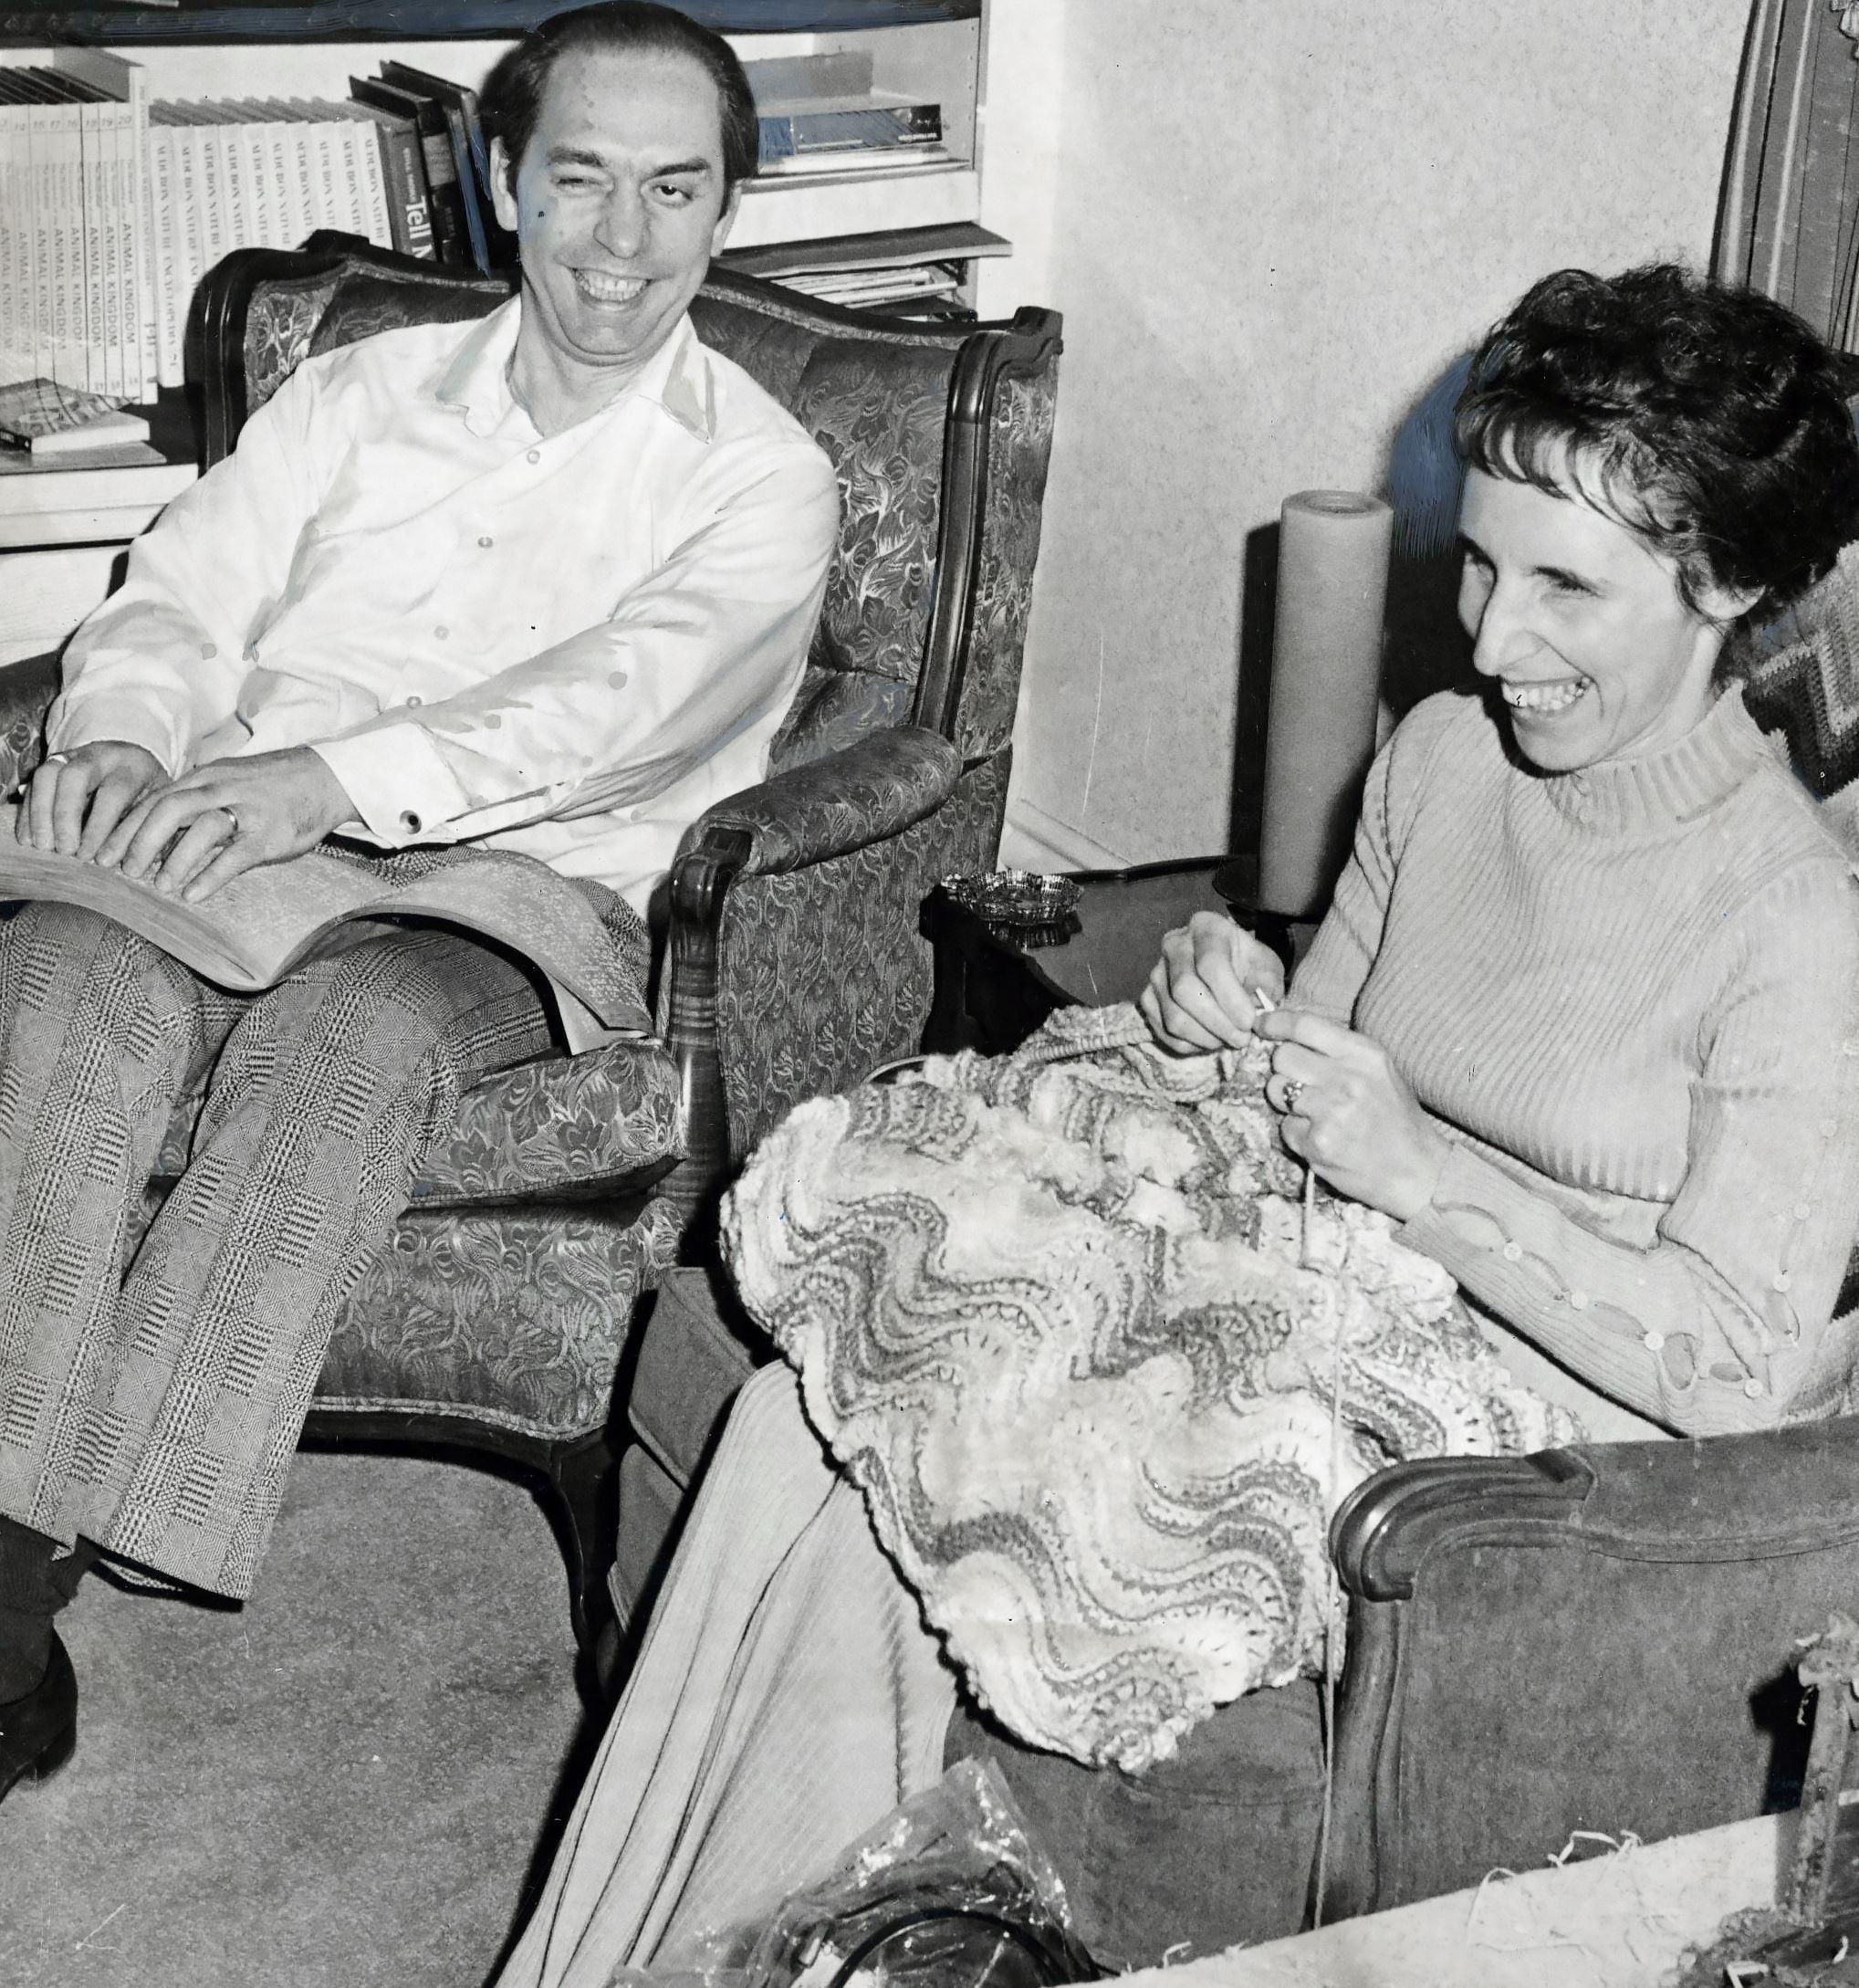 Lloyd-Fuge-3-2 Lloyd H. Fuge with his wife, Dorothy, in December 1973.